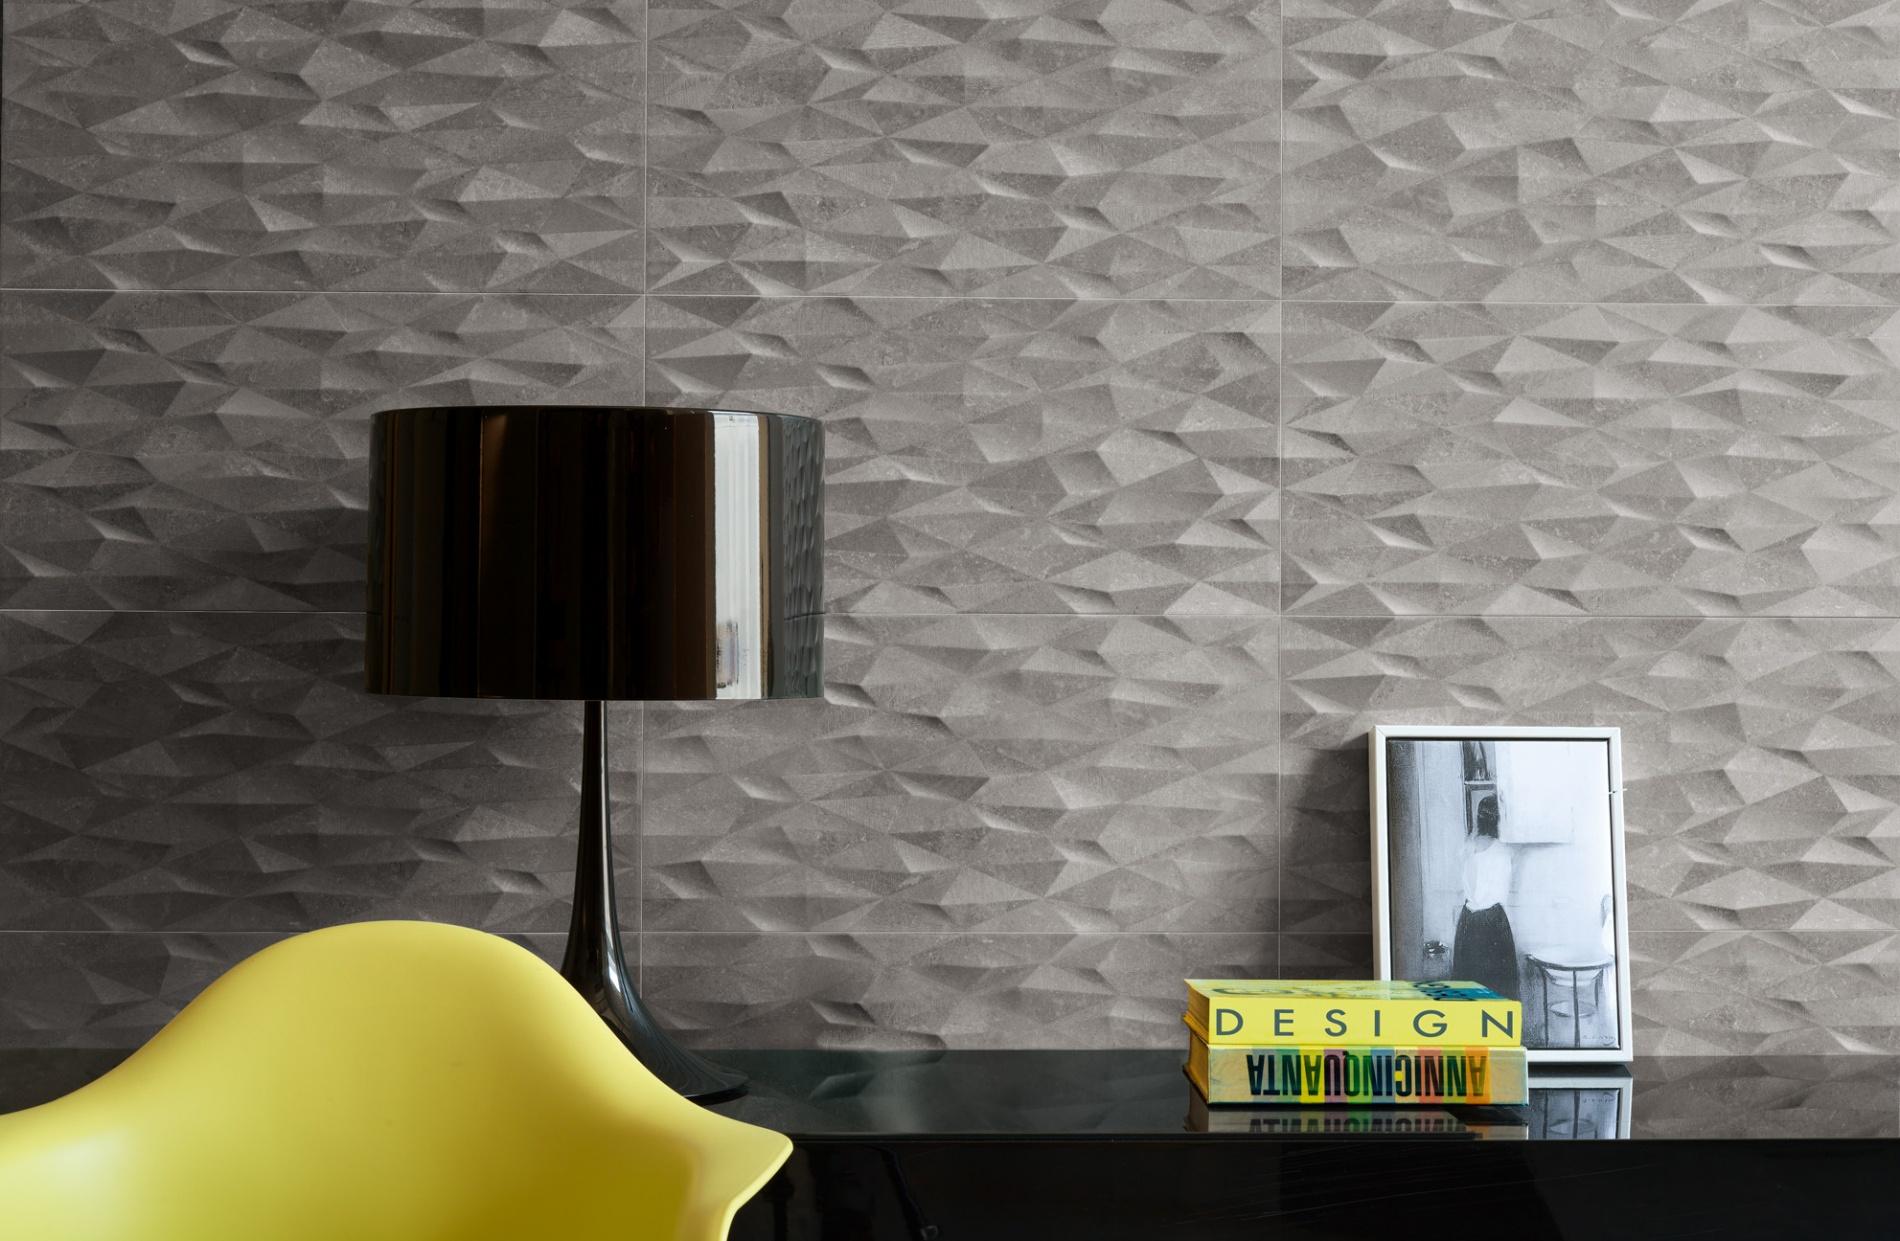 porcelain tile images: Timeless range high quality photo